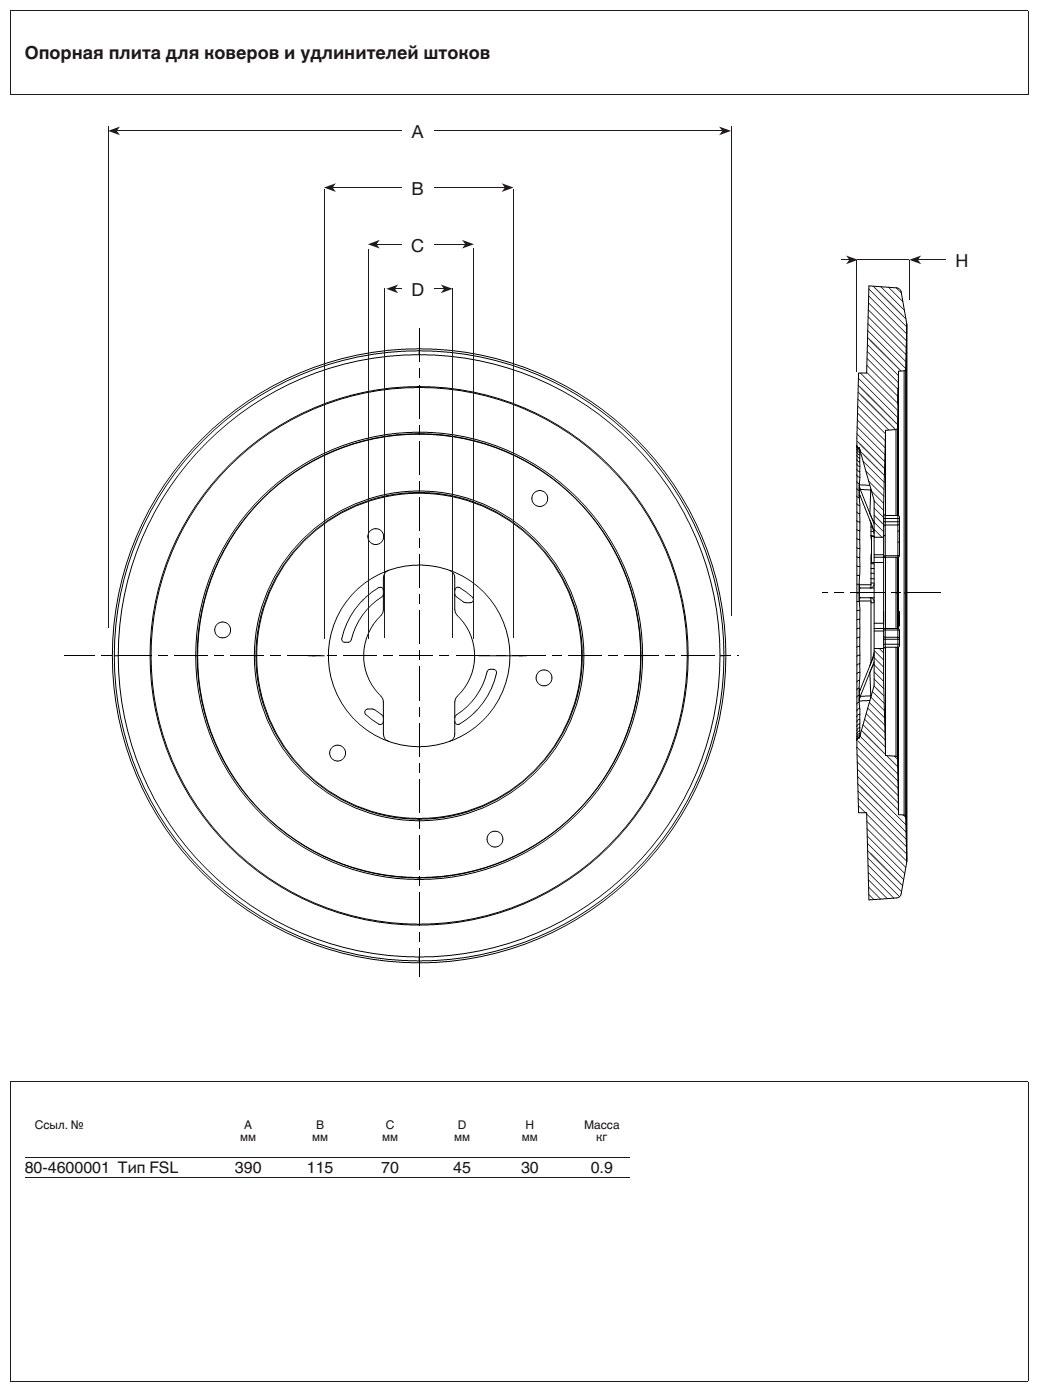 AVK опорная плита типа FSL